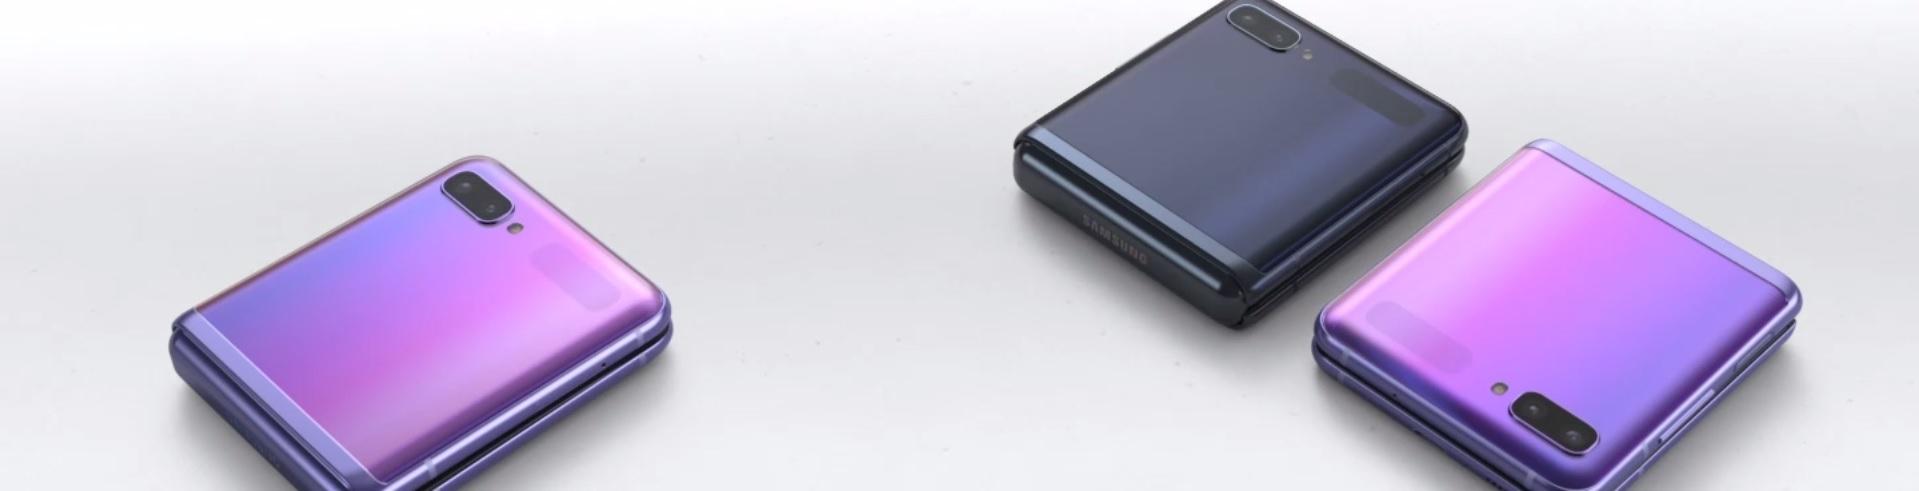 Samsung Galaxy Z Flip Mirror Black Purple